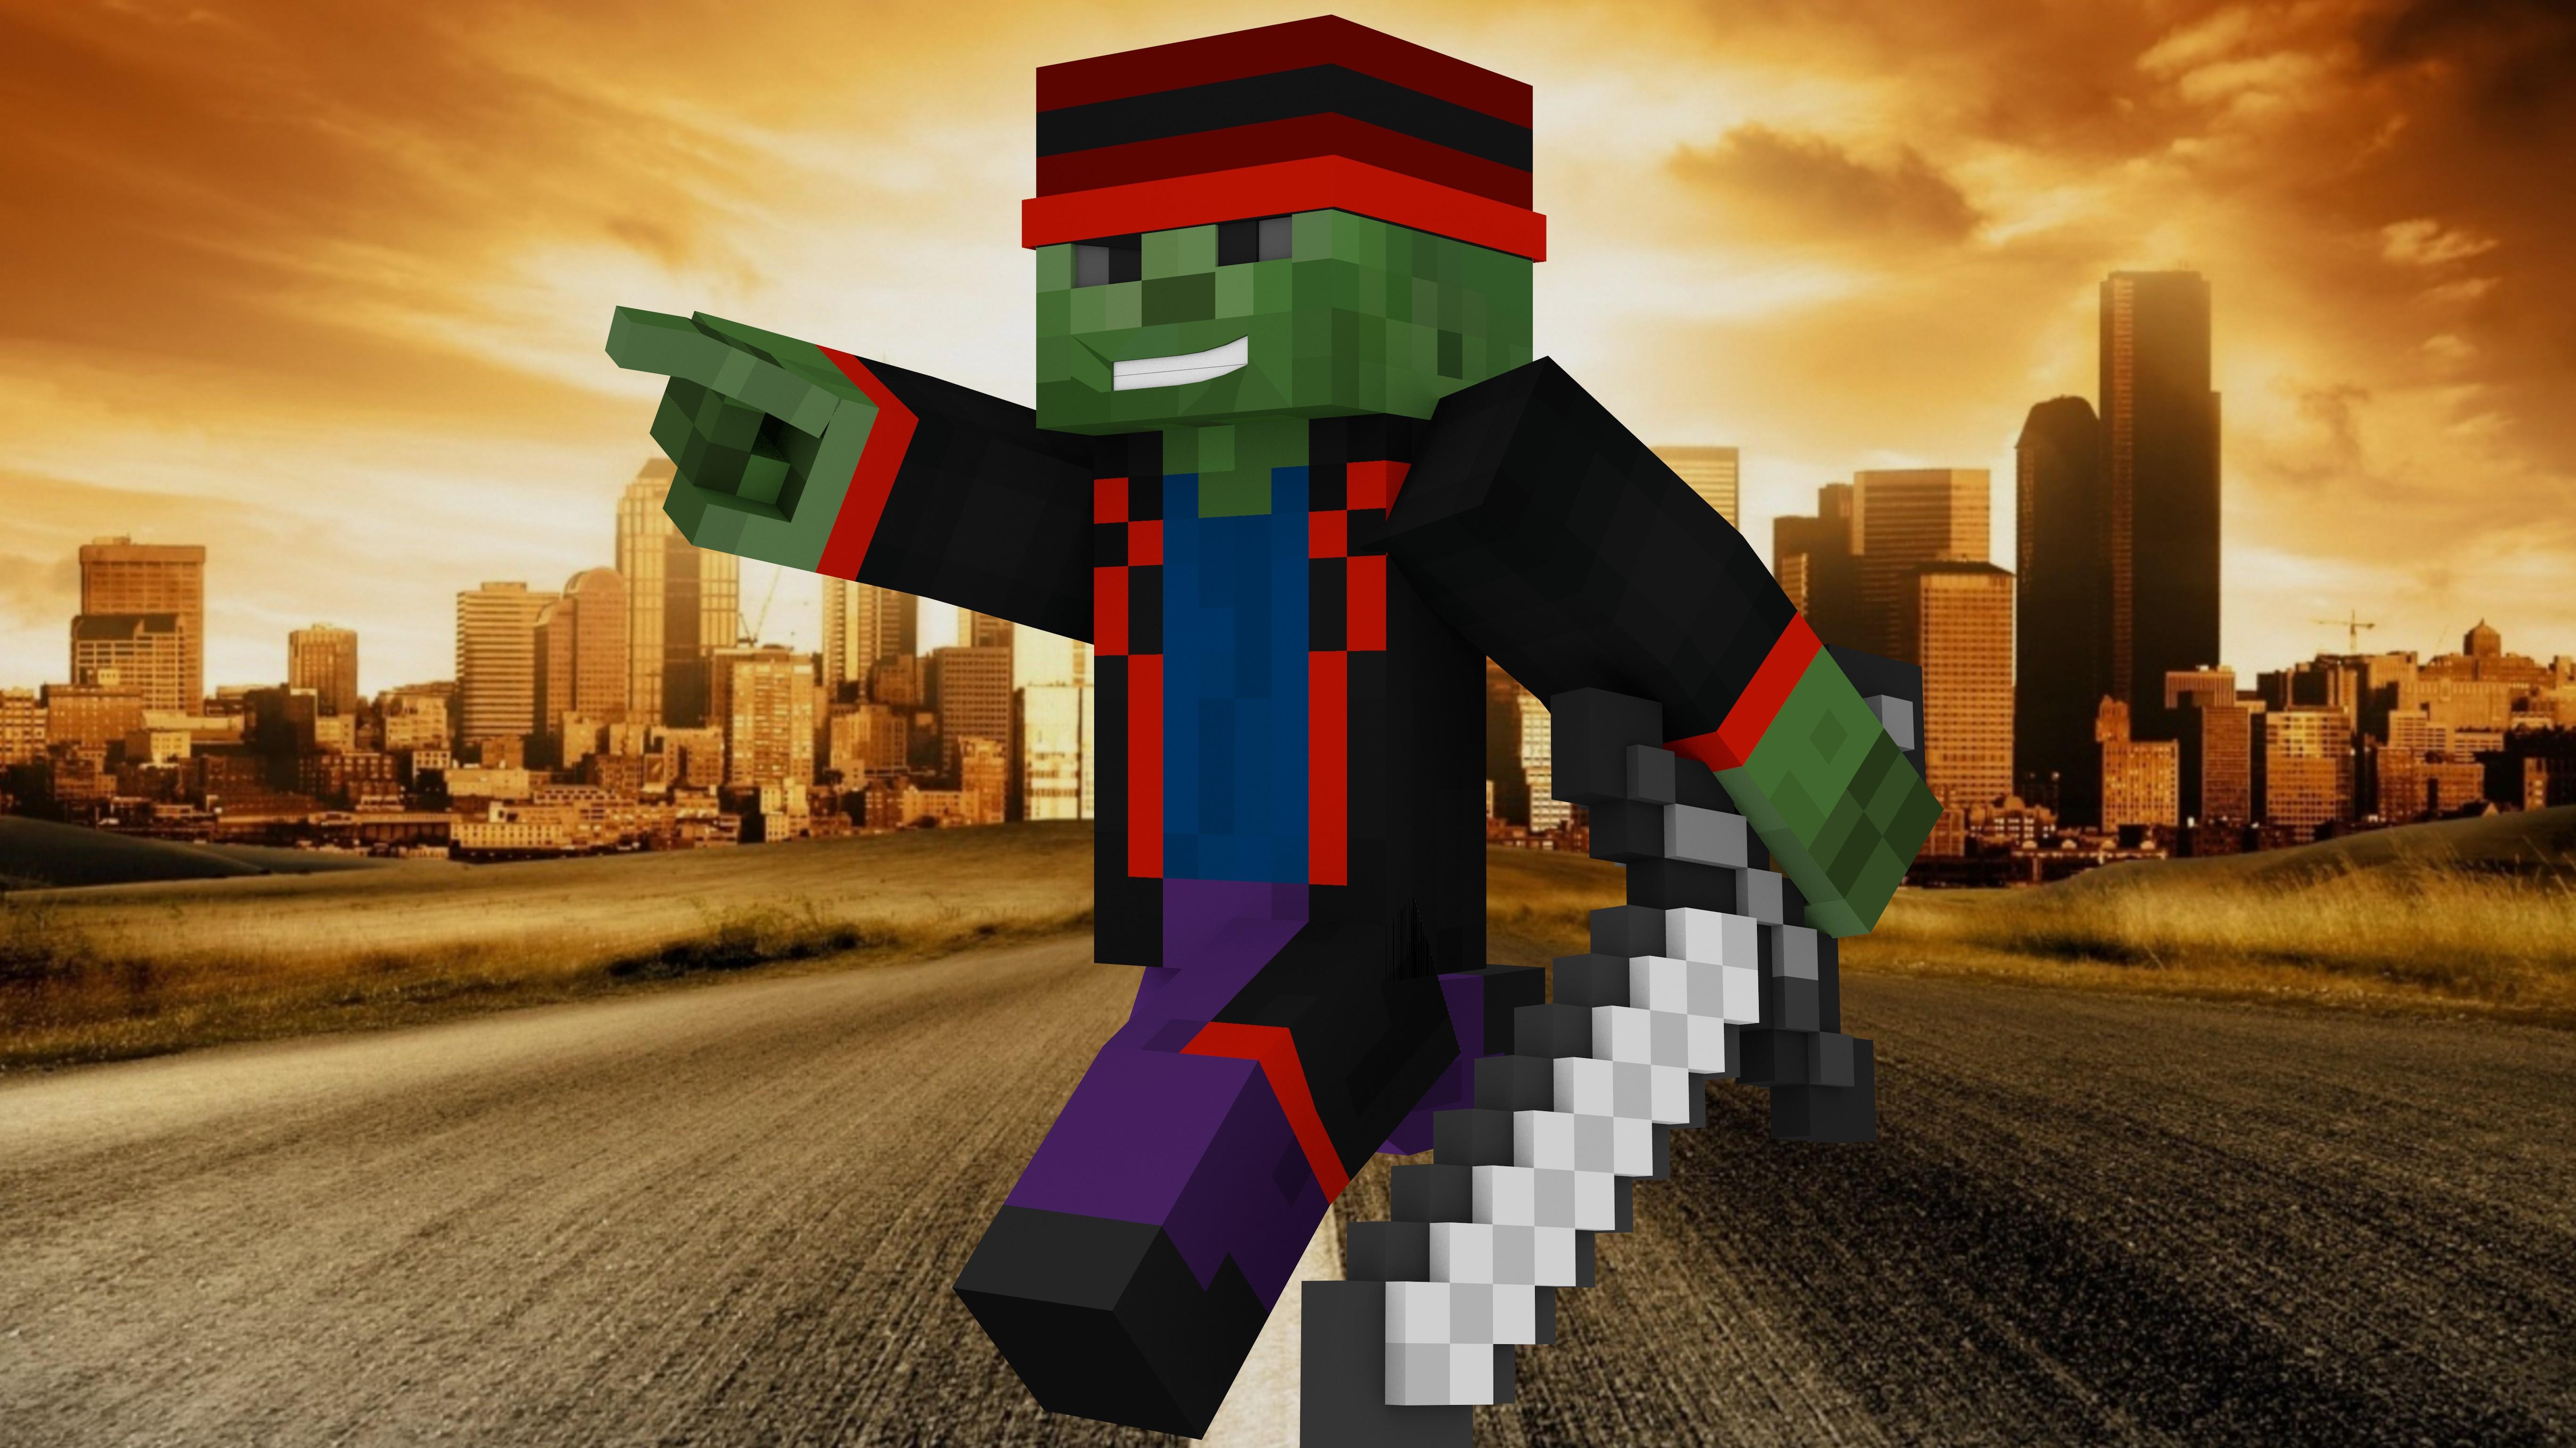 Cool Zombie (A Minecraft Skin) by Coreycool10 on DeviantArt